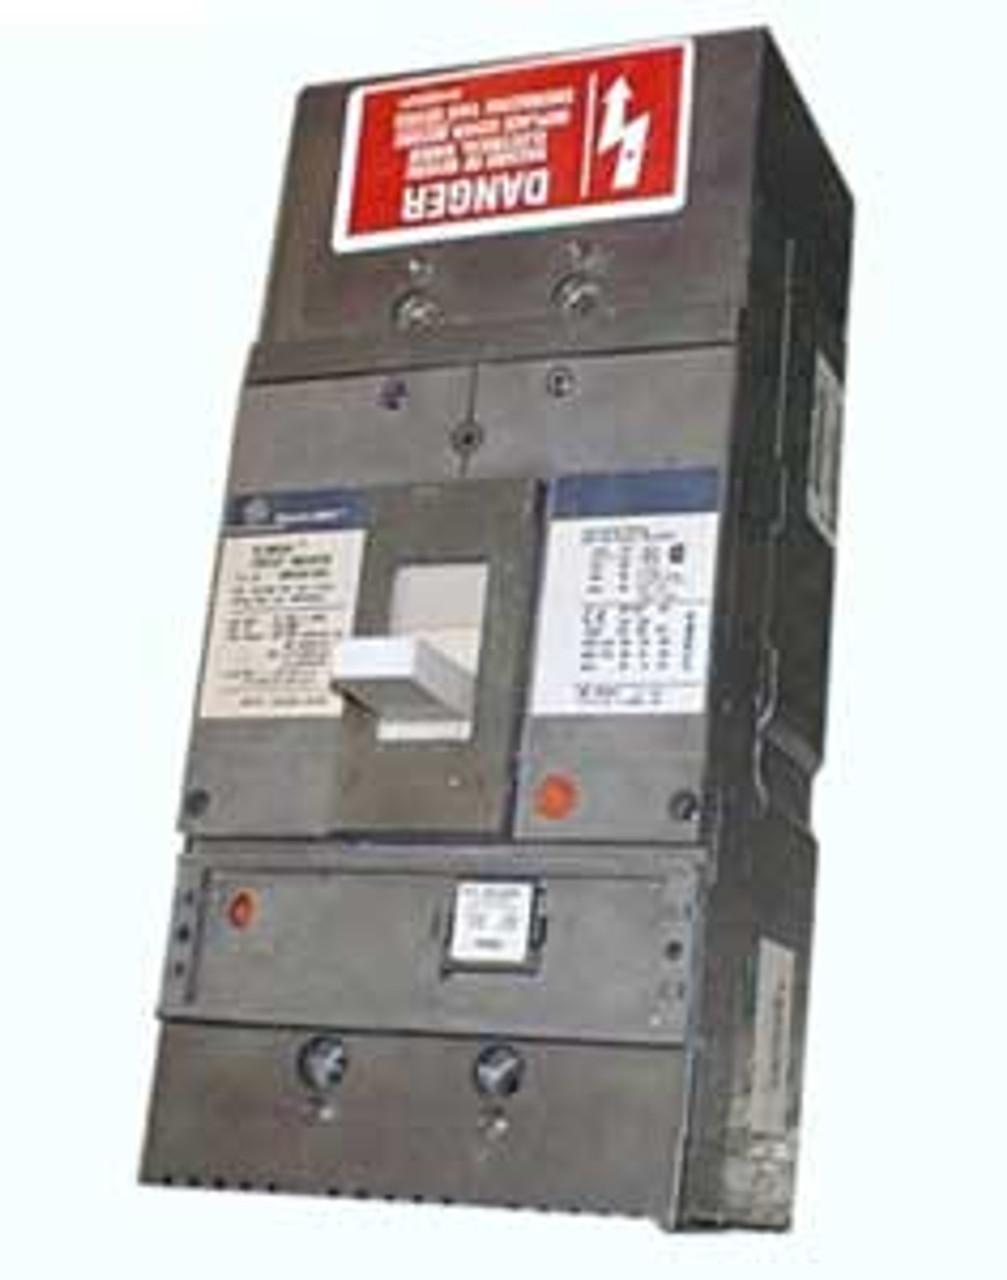 GE SGLA36AT0400 3 Pole 125Amp Plug 600V 65K@480V Circuit Breaker - Used